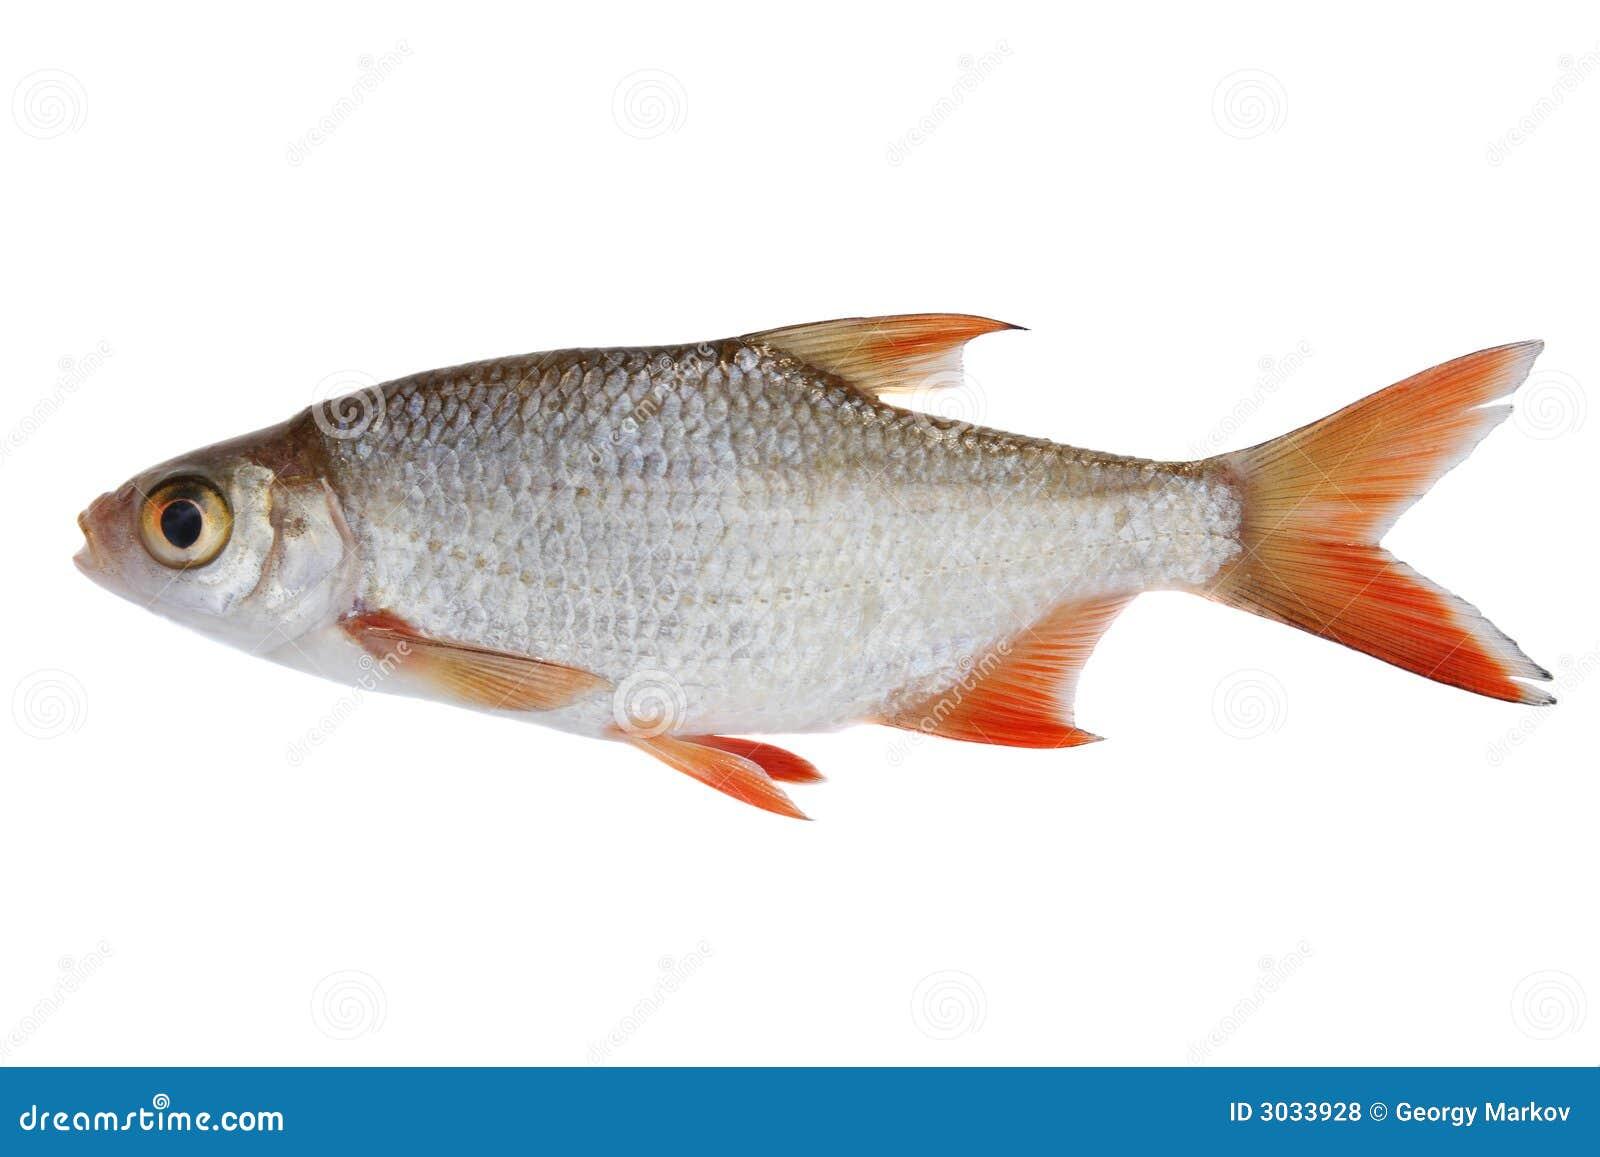 Small Fish Royalty Free Stock Photos Image 3033928